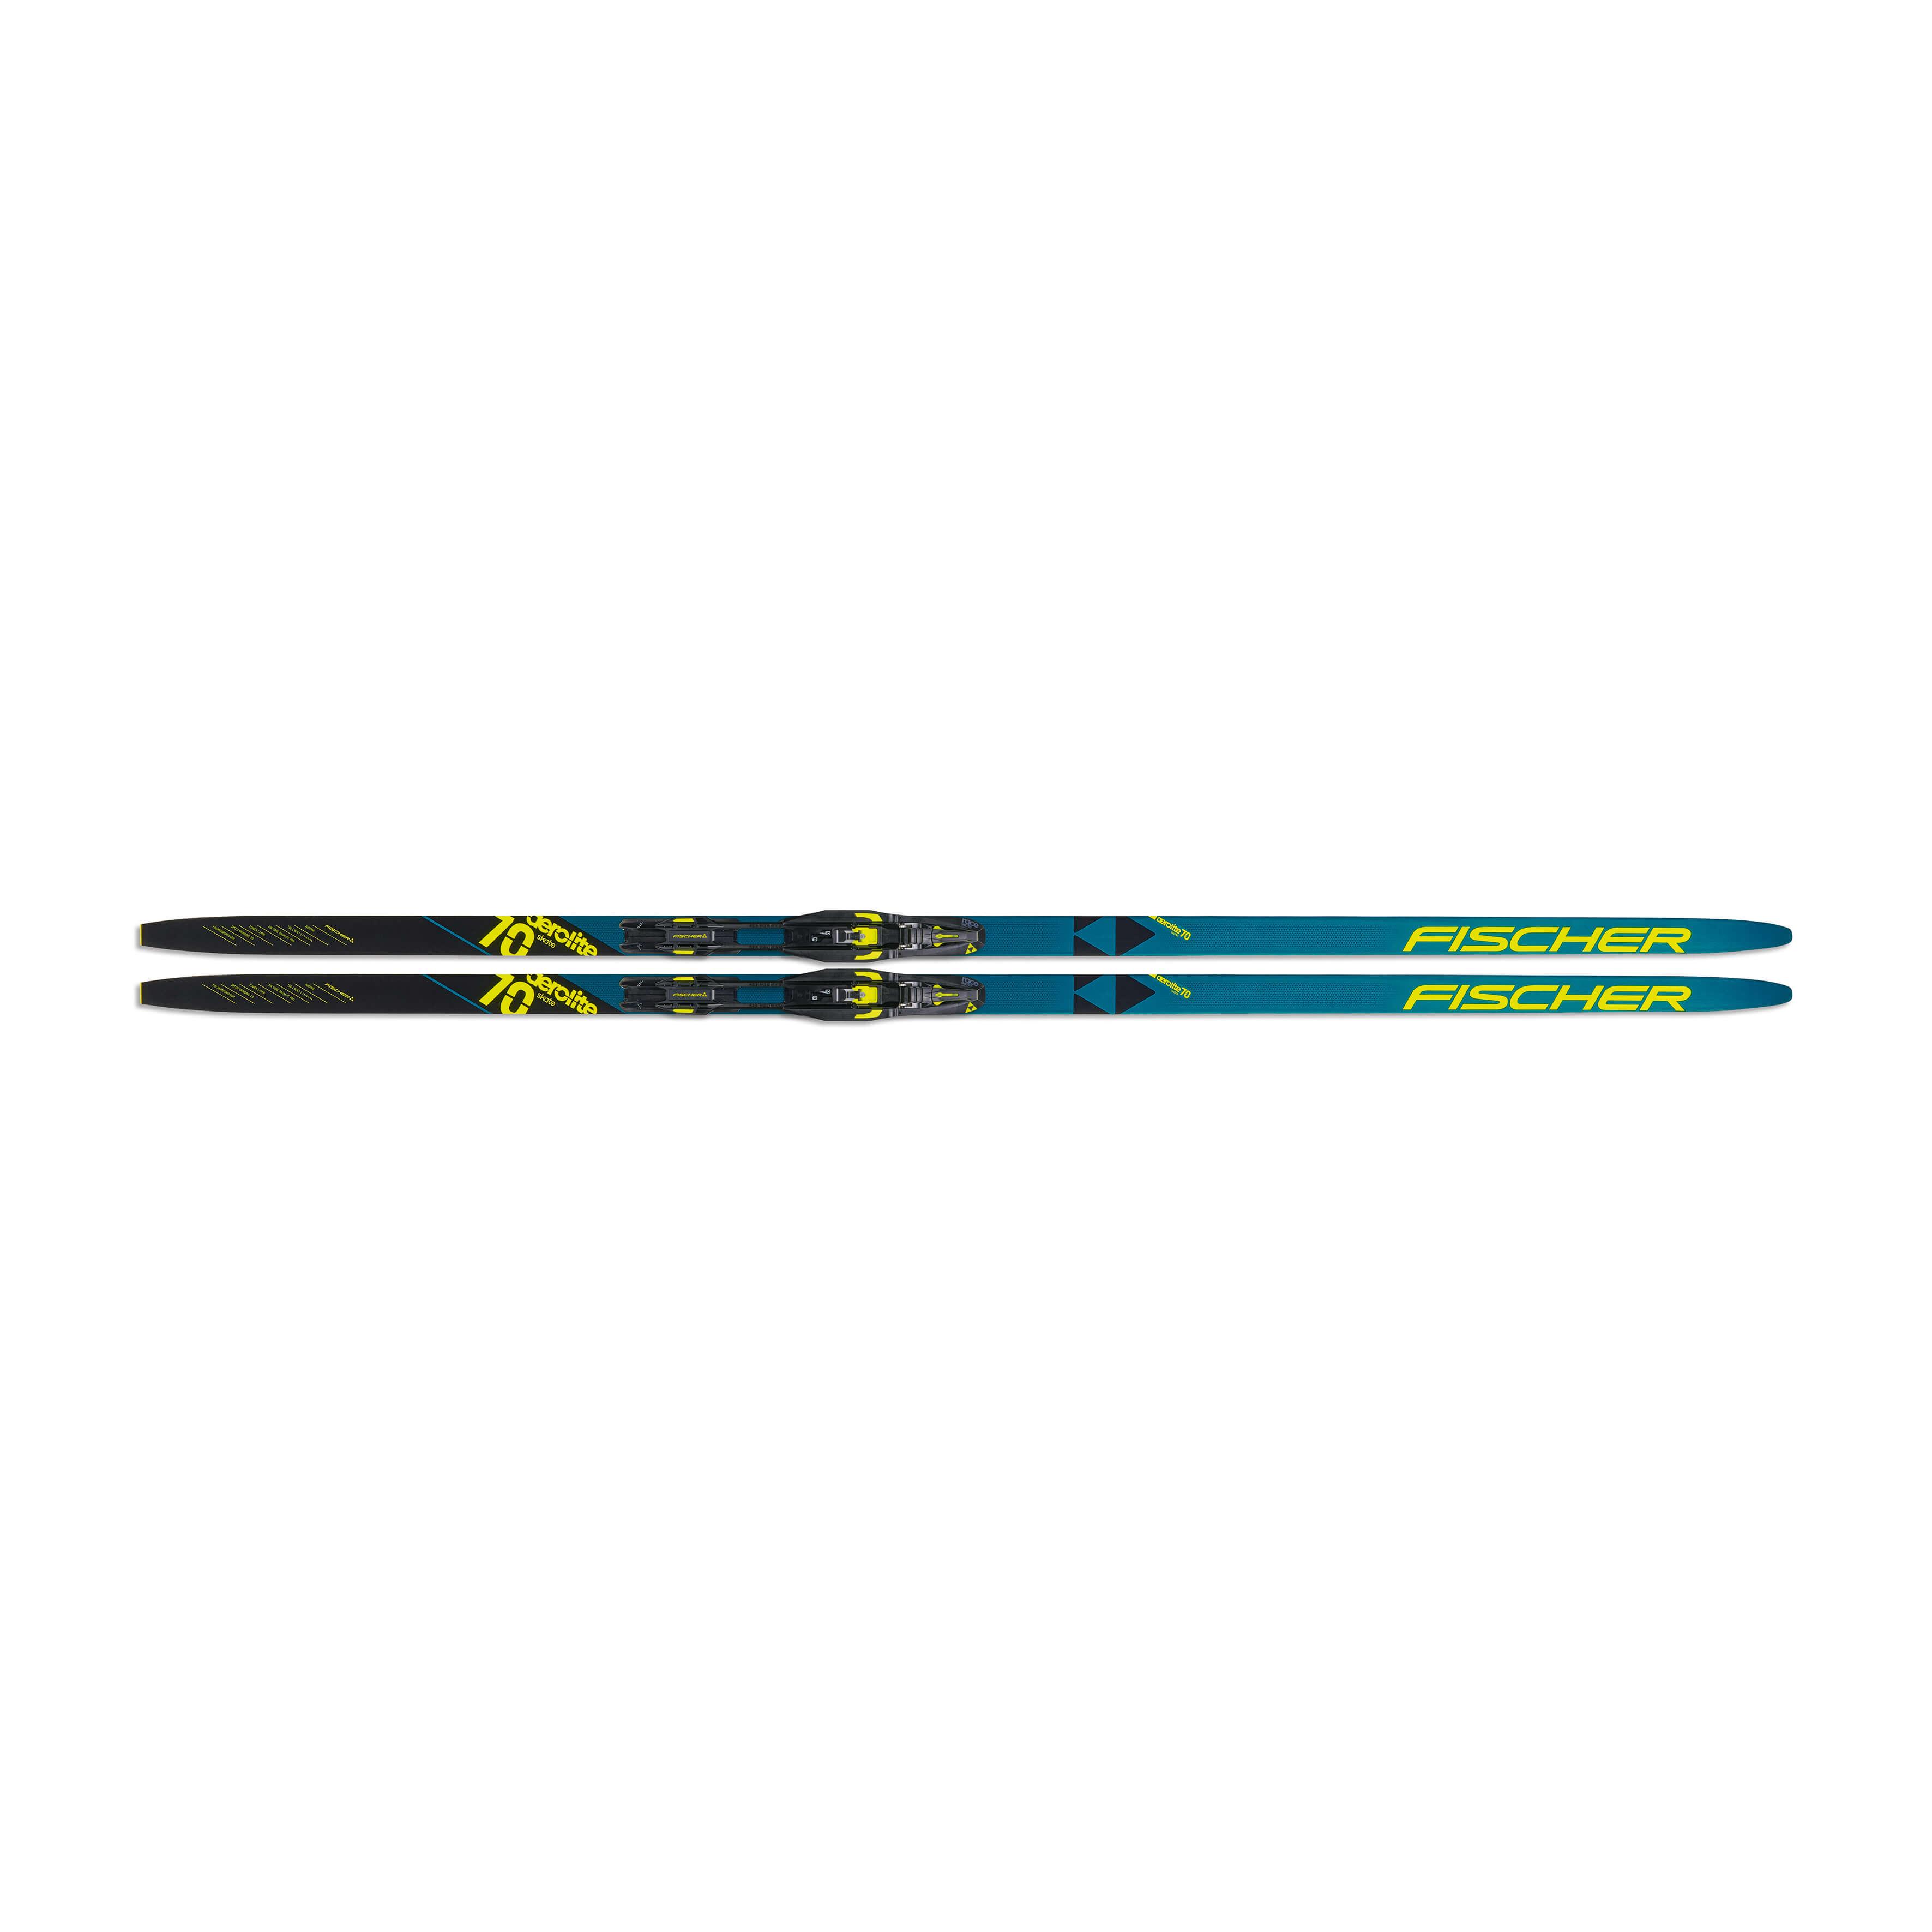 Běžky Fischer AEROLITE SKATE 70 BLUE + RACE SKATE 20/21 Velikost: 166